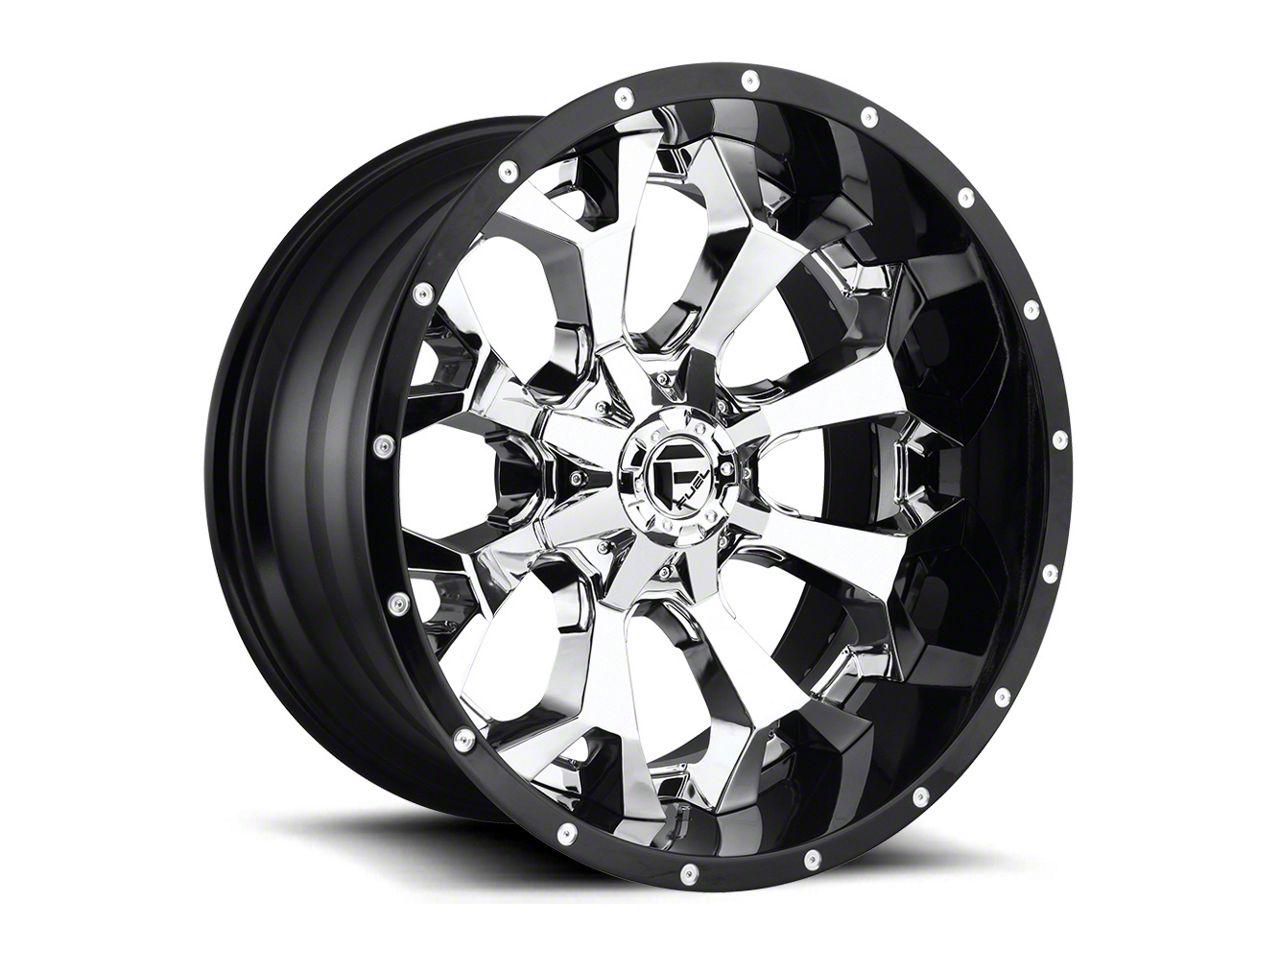 Fuel Wheels Assault Chrome 6-Lug Wheel - 20x10 (07-18 Sierra 1500)